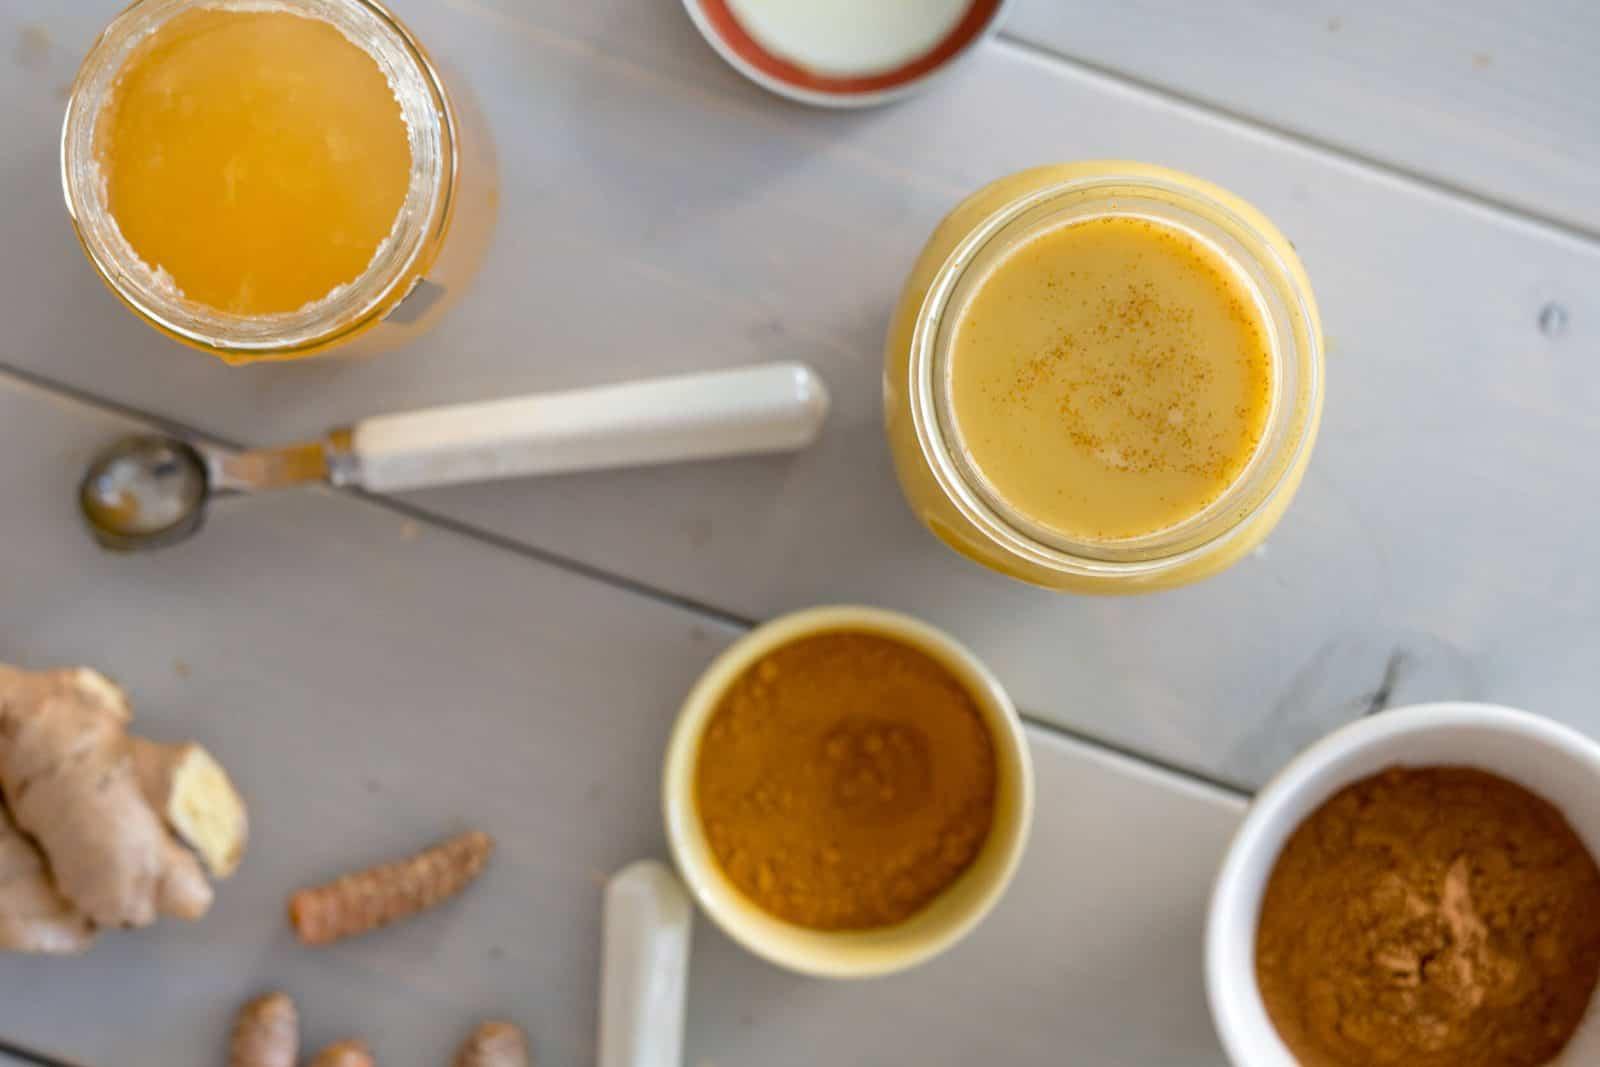 Agua Com Mel E Canela Beneficios goldenlatte ou leite dourado